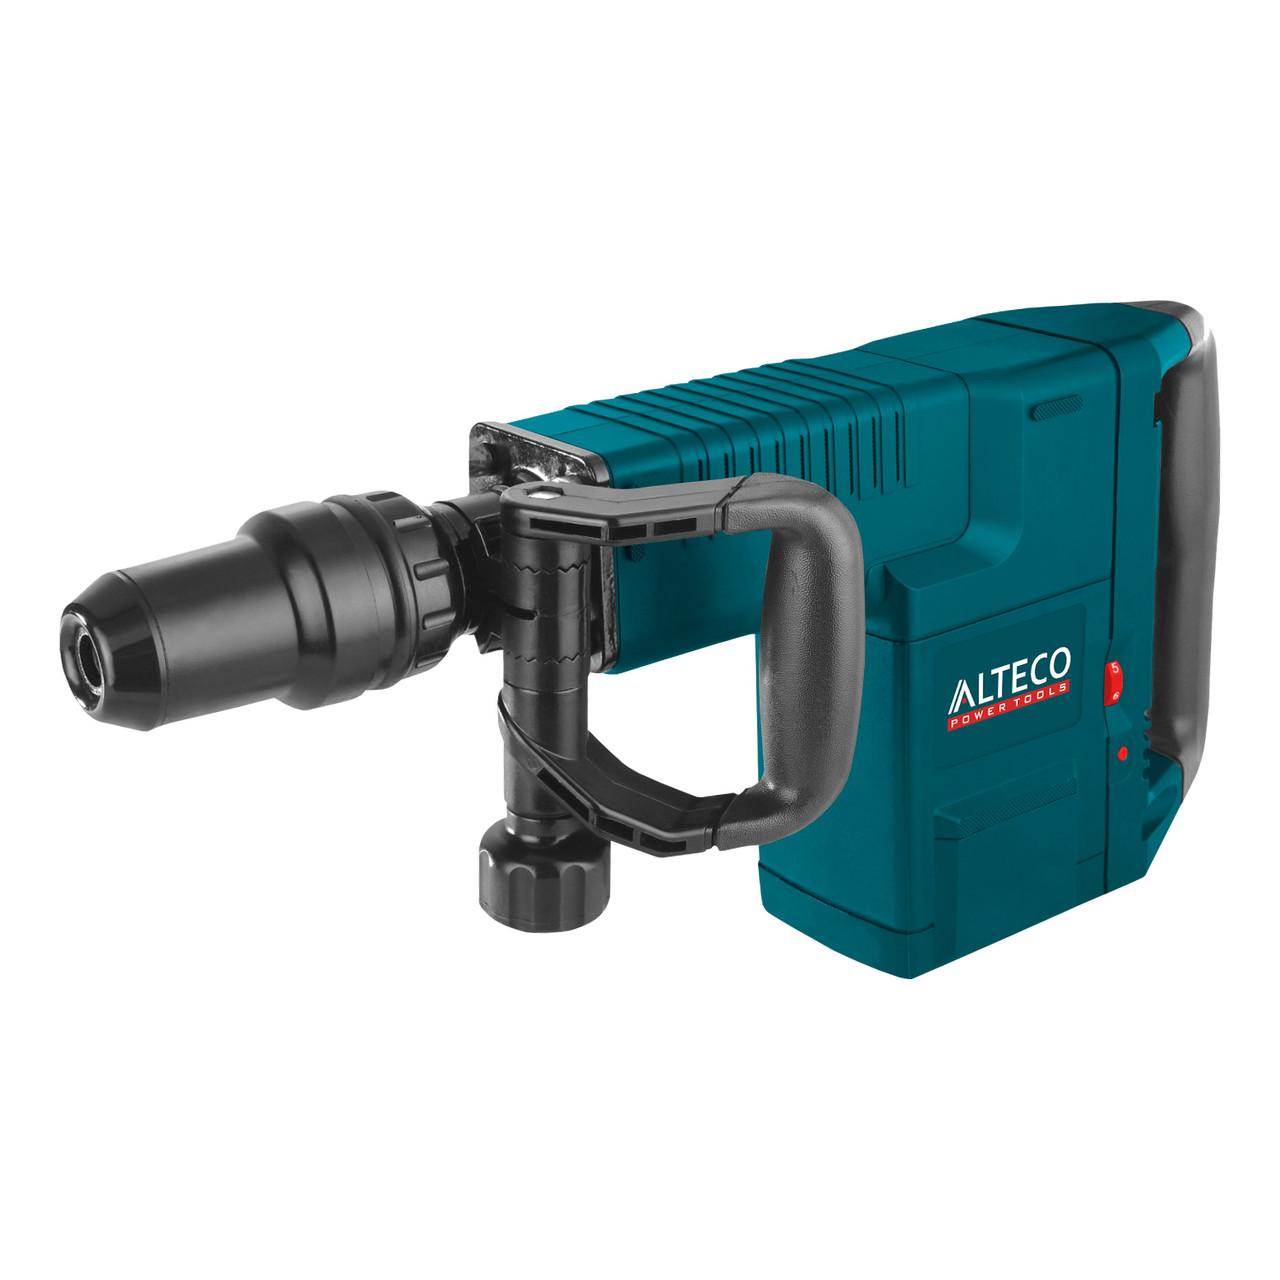 ALTECO DH 1700-25 SDS-Max Отбойный молоток